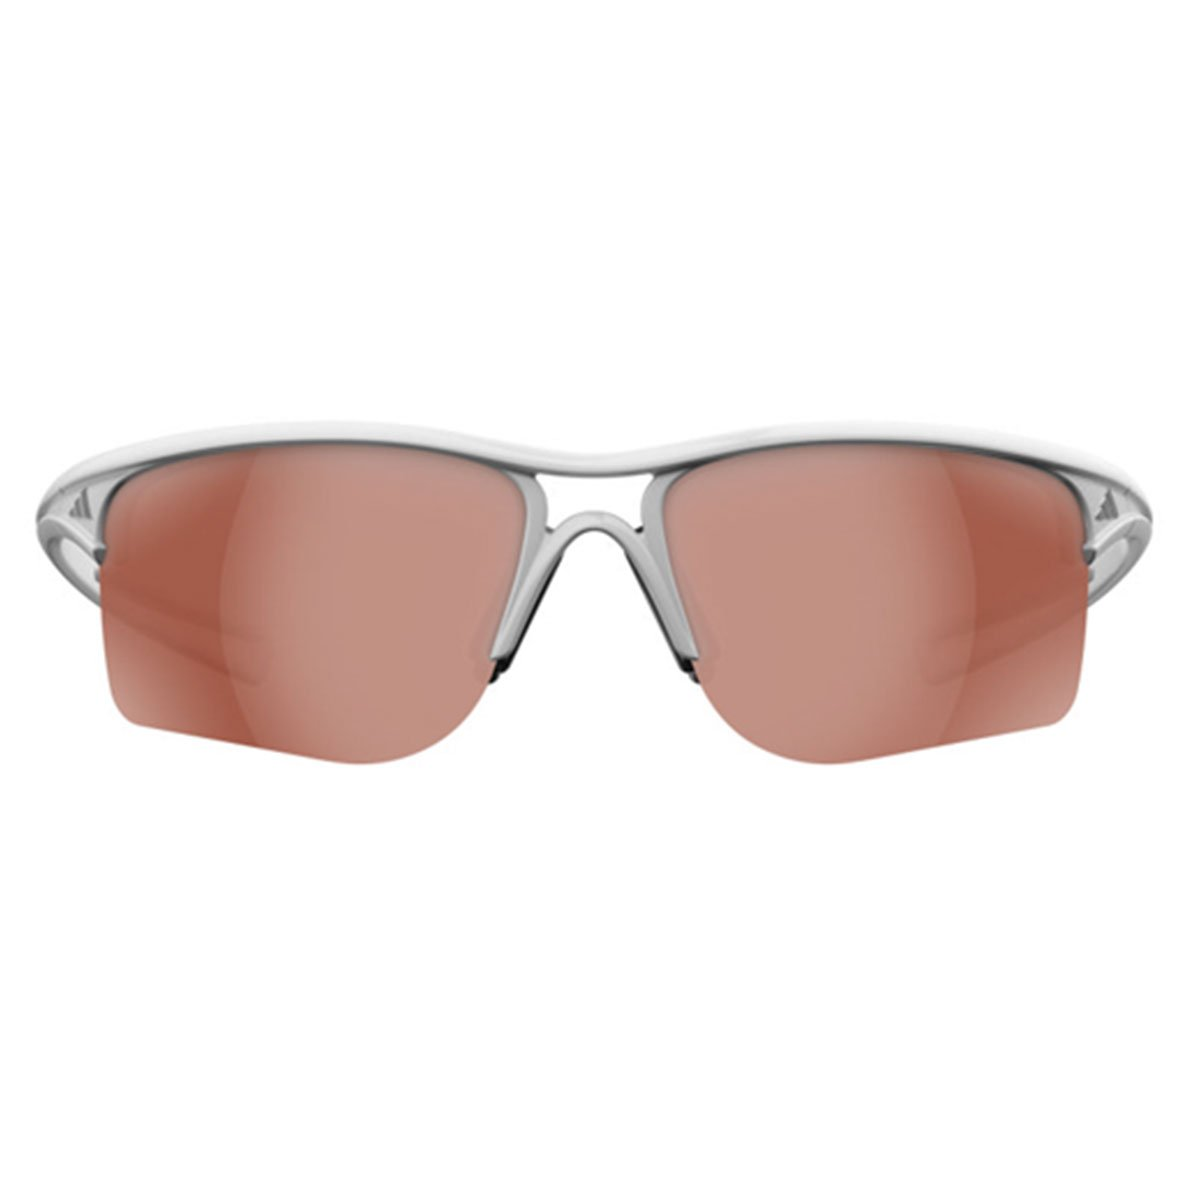 Sunglasses Adidas raylor S a 405 6051 white